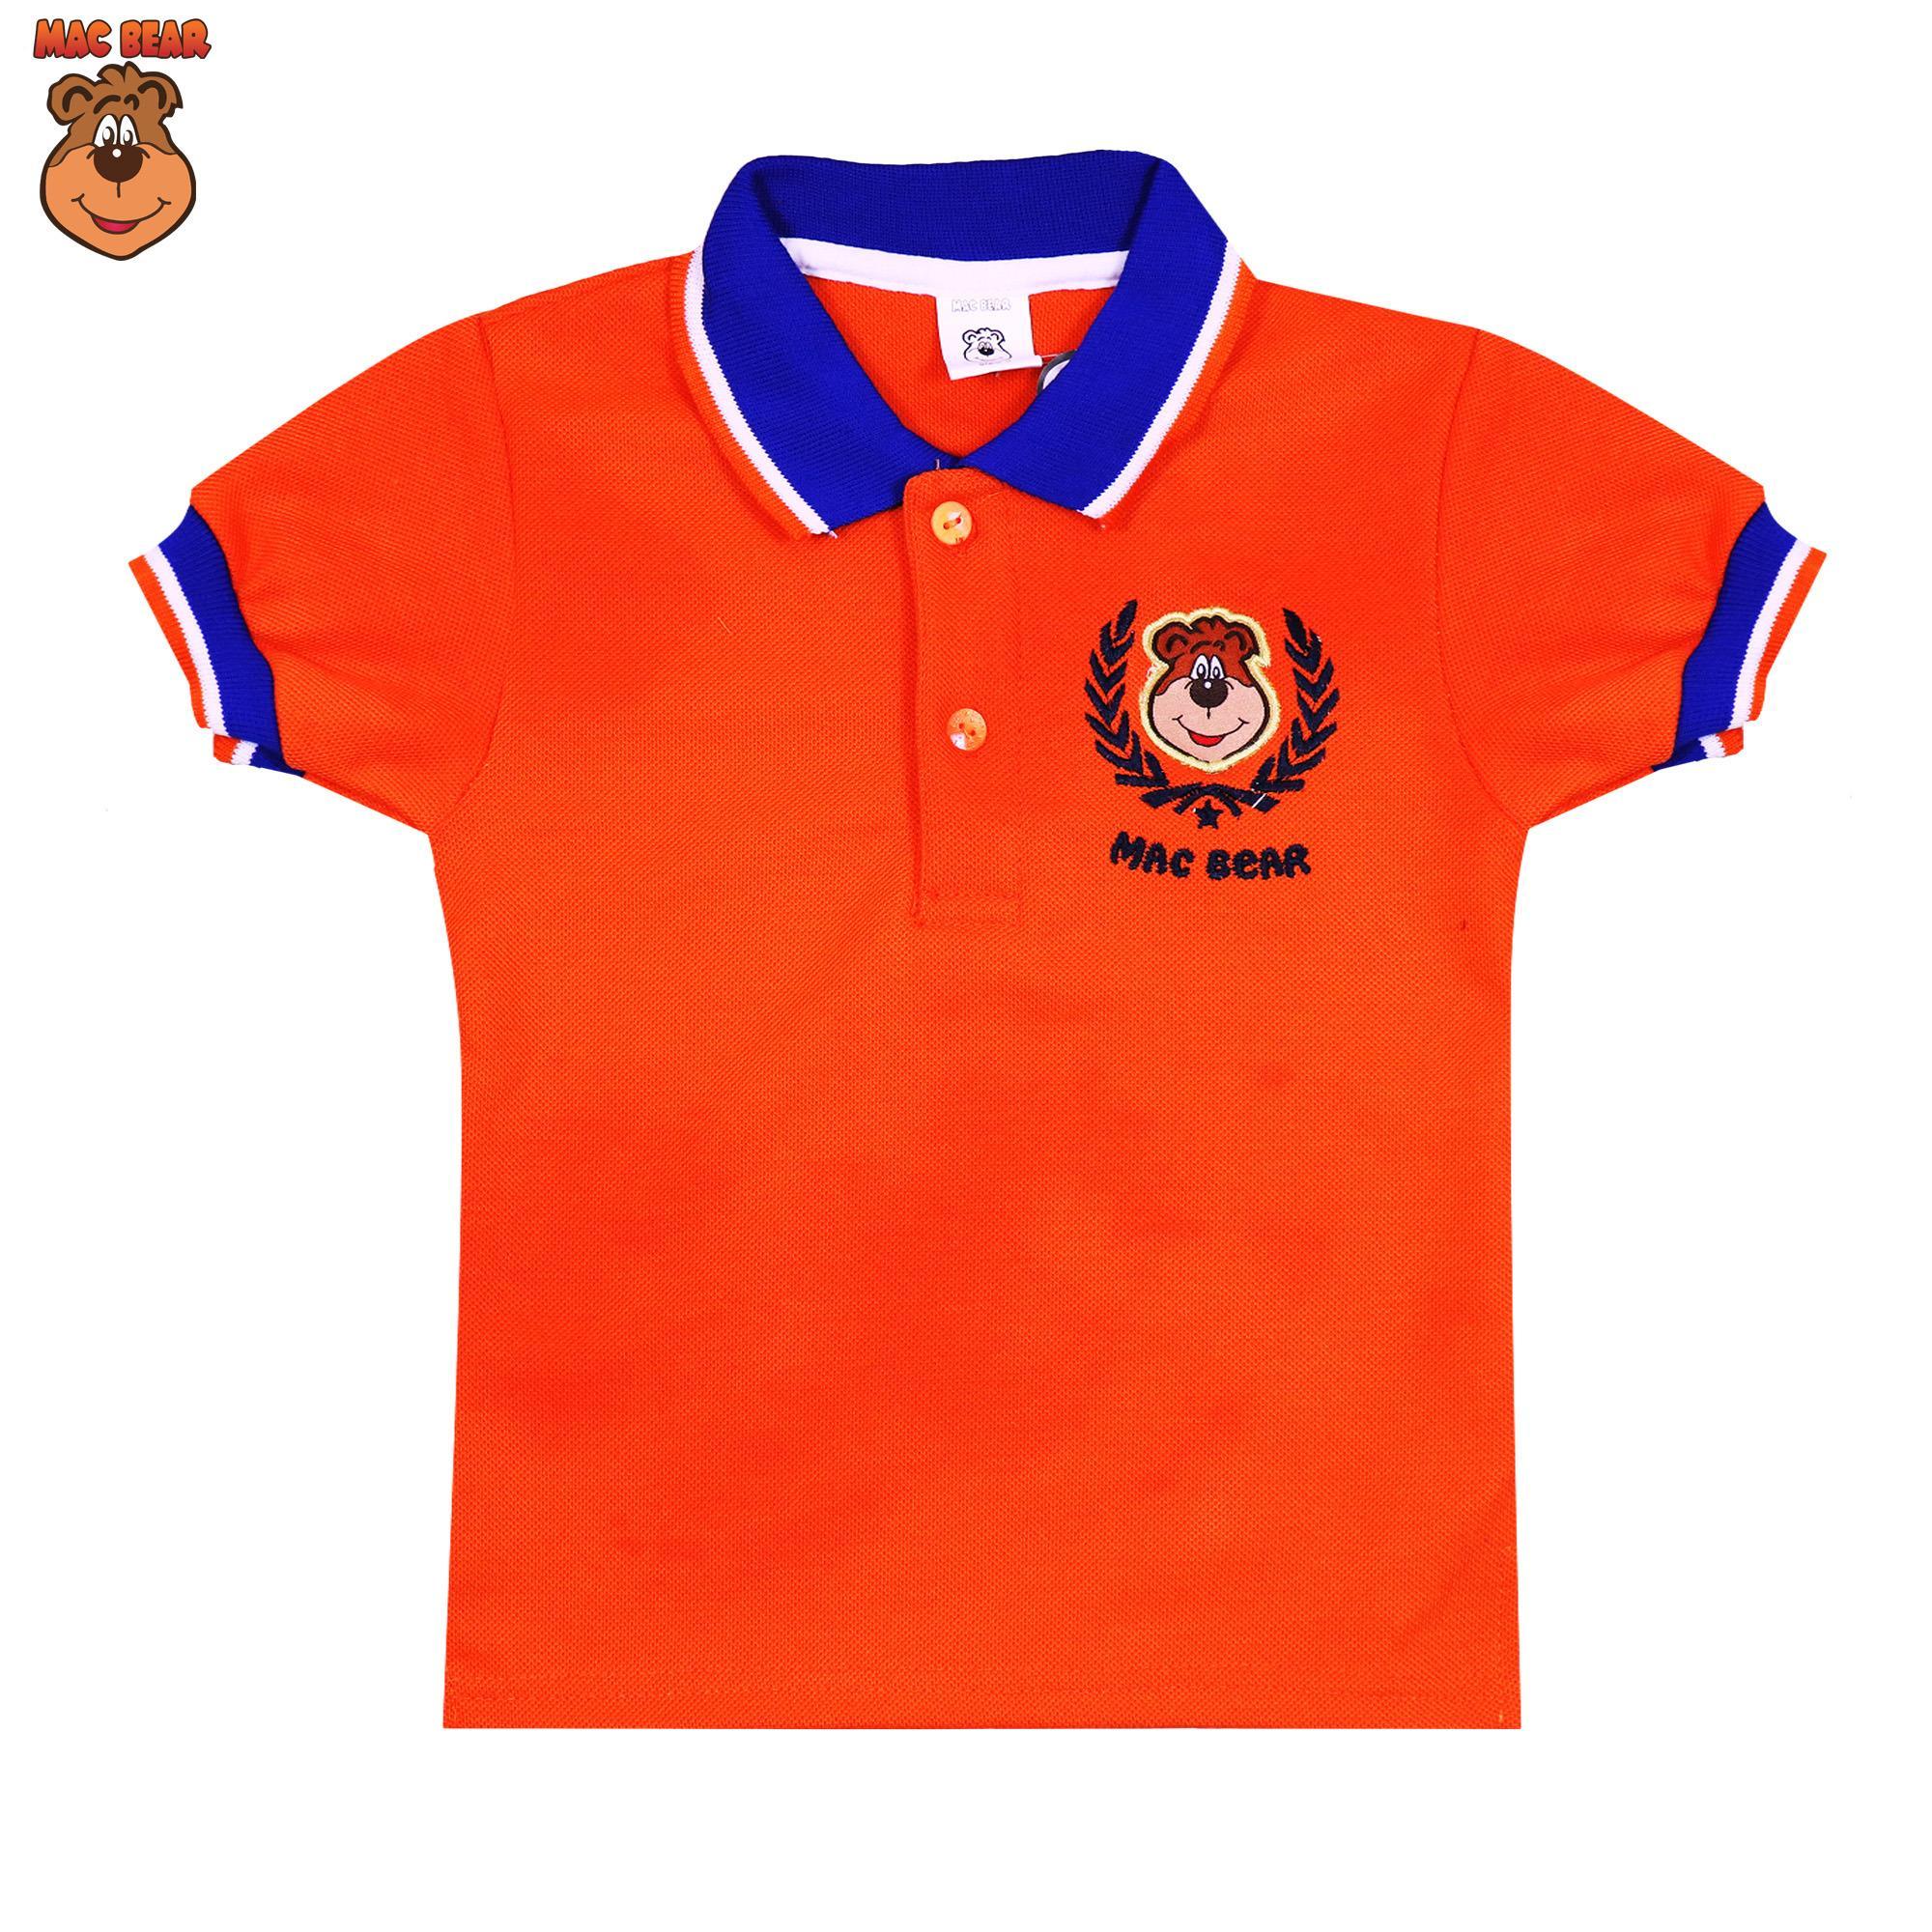 Macbear Baju Polo Anak M For White Stripes On Yellow Size 4 De5 1805 Junior Kemeja Lengan Panjang 3 Stars Blue 12 Biru Hello Macperry Toko Online Terbaik Source Kids